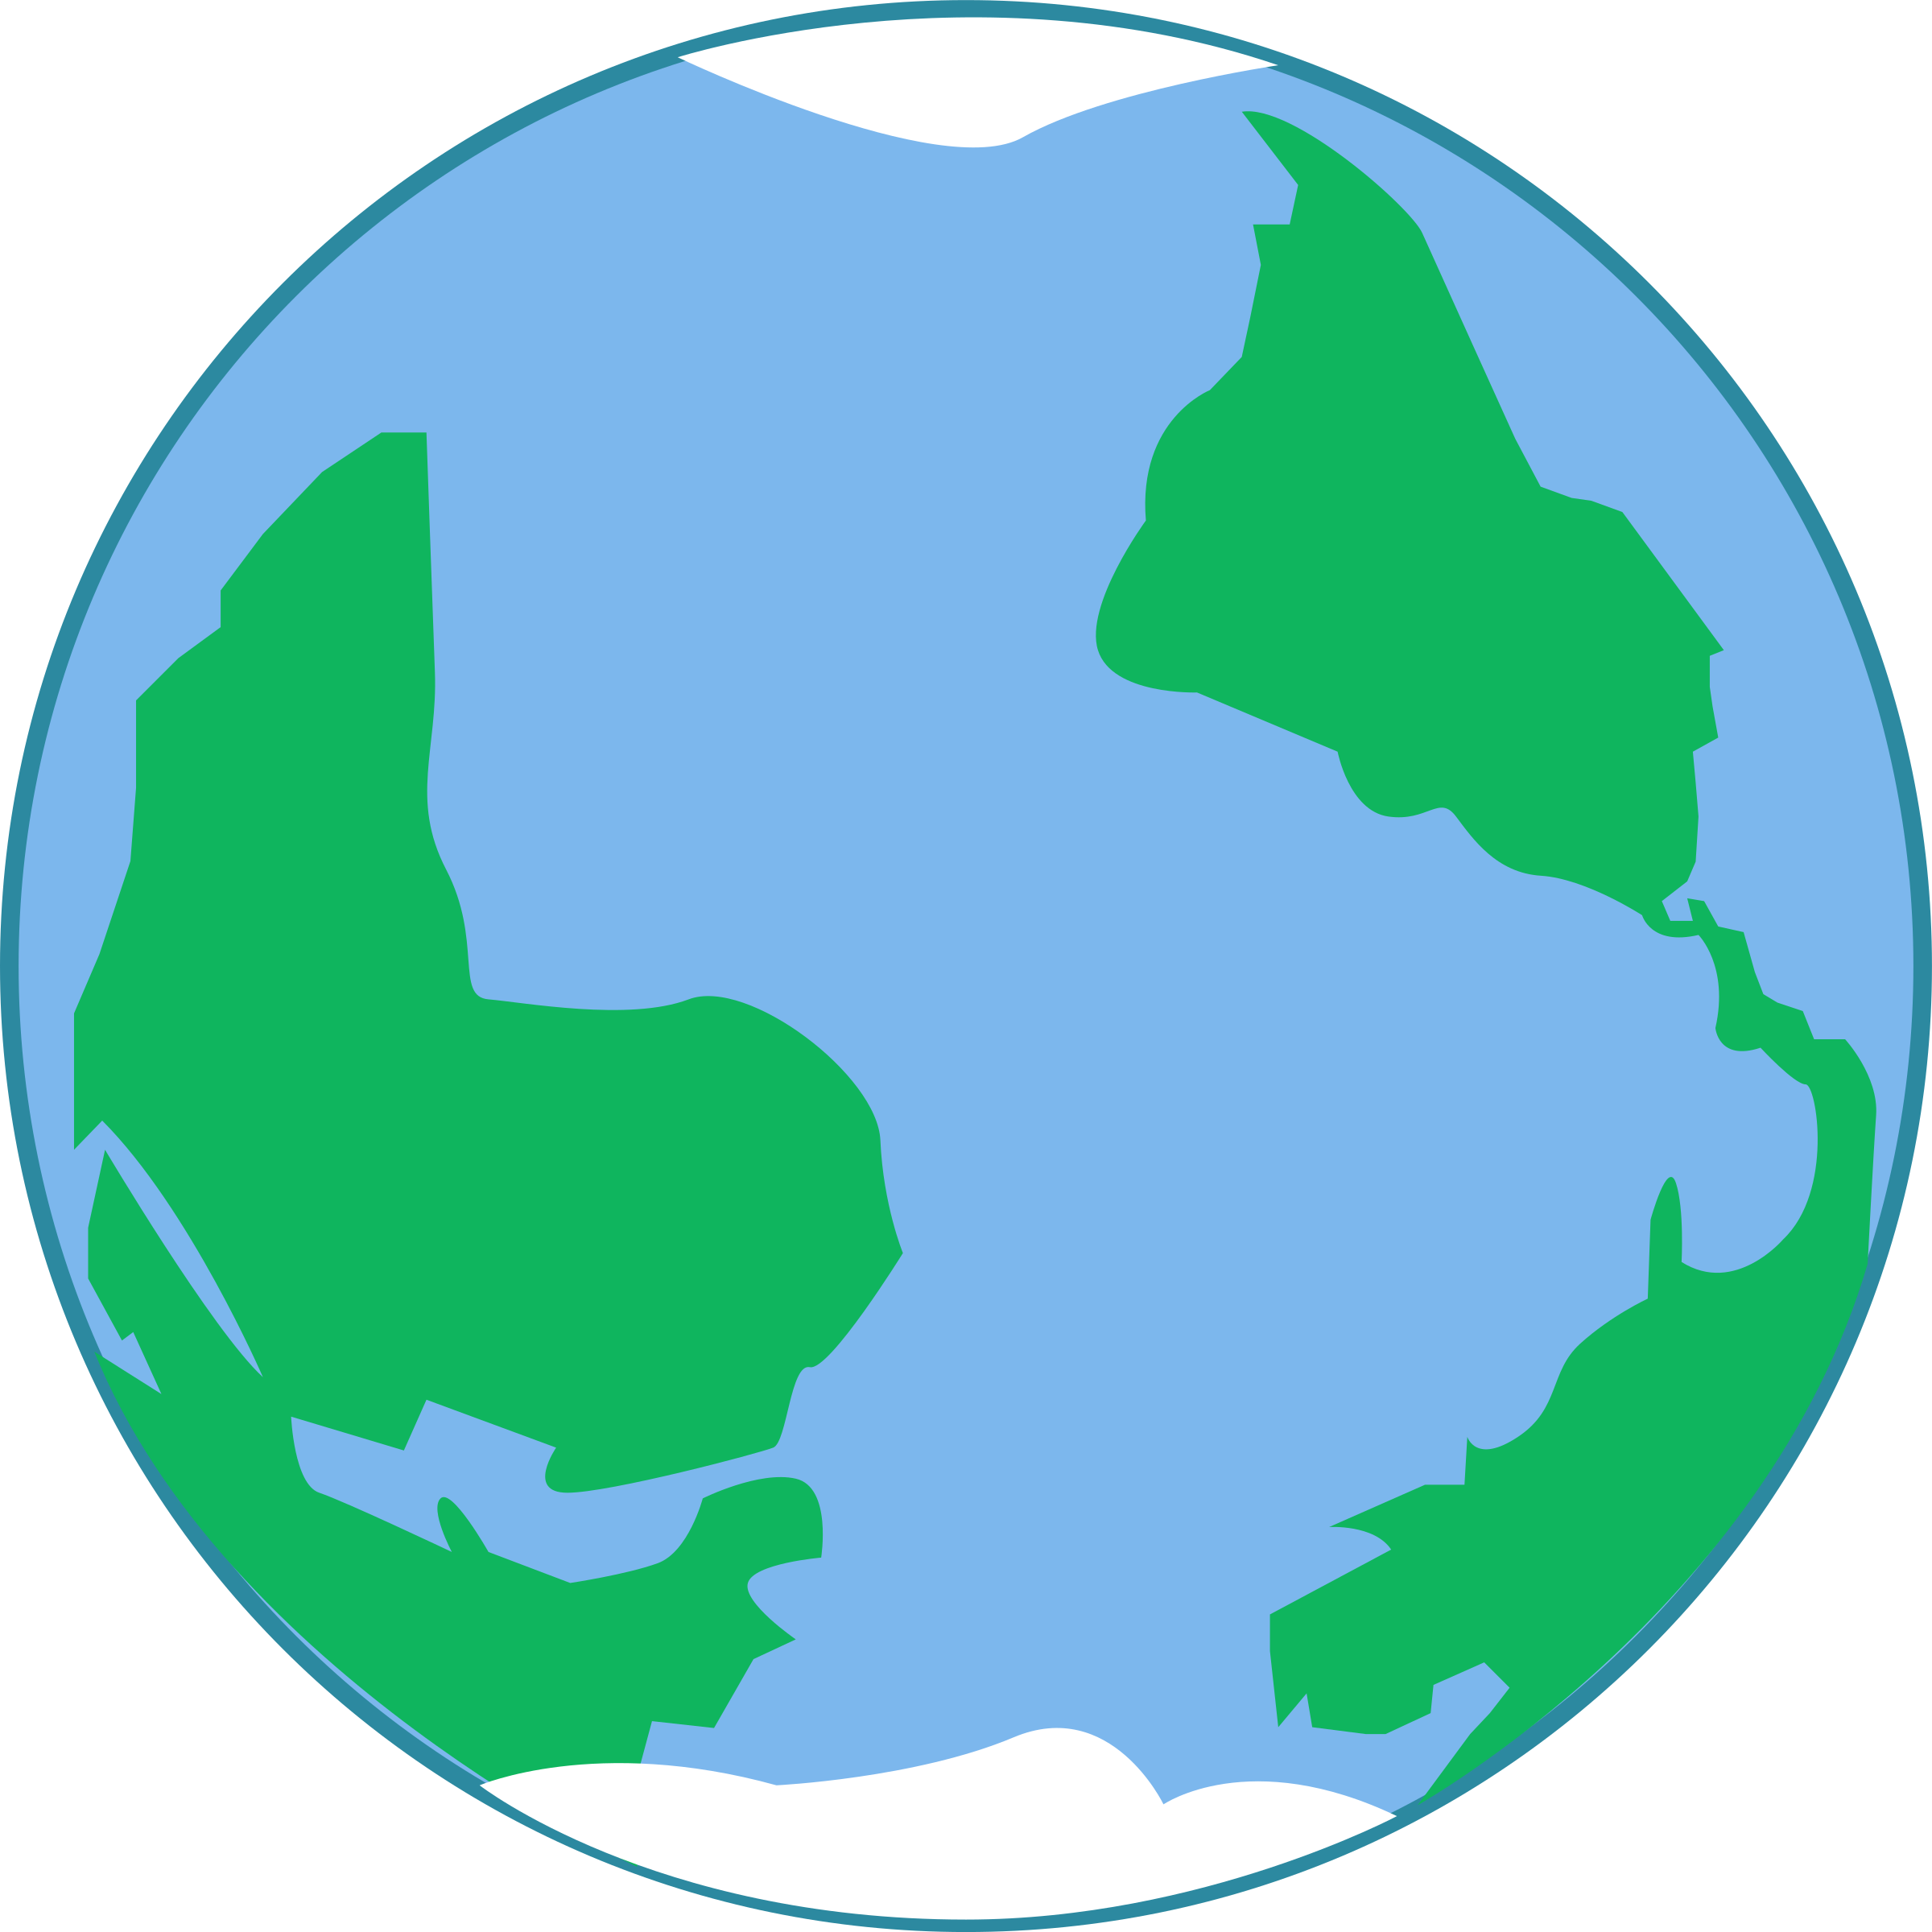 Planet clipart cartoon. Earth at getdrawings com